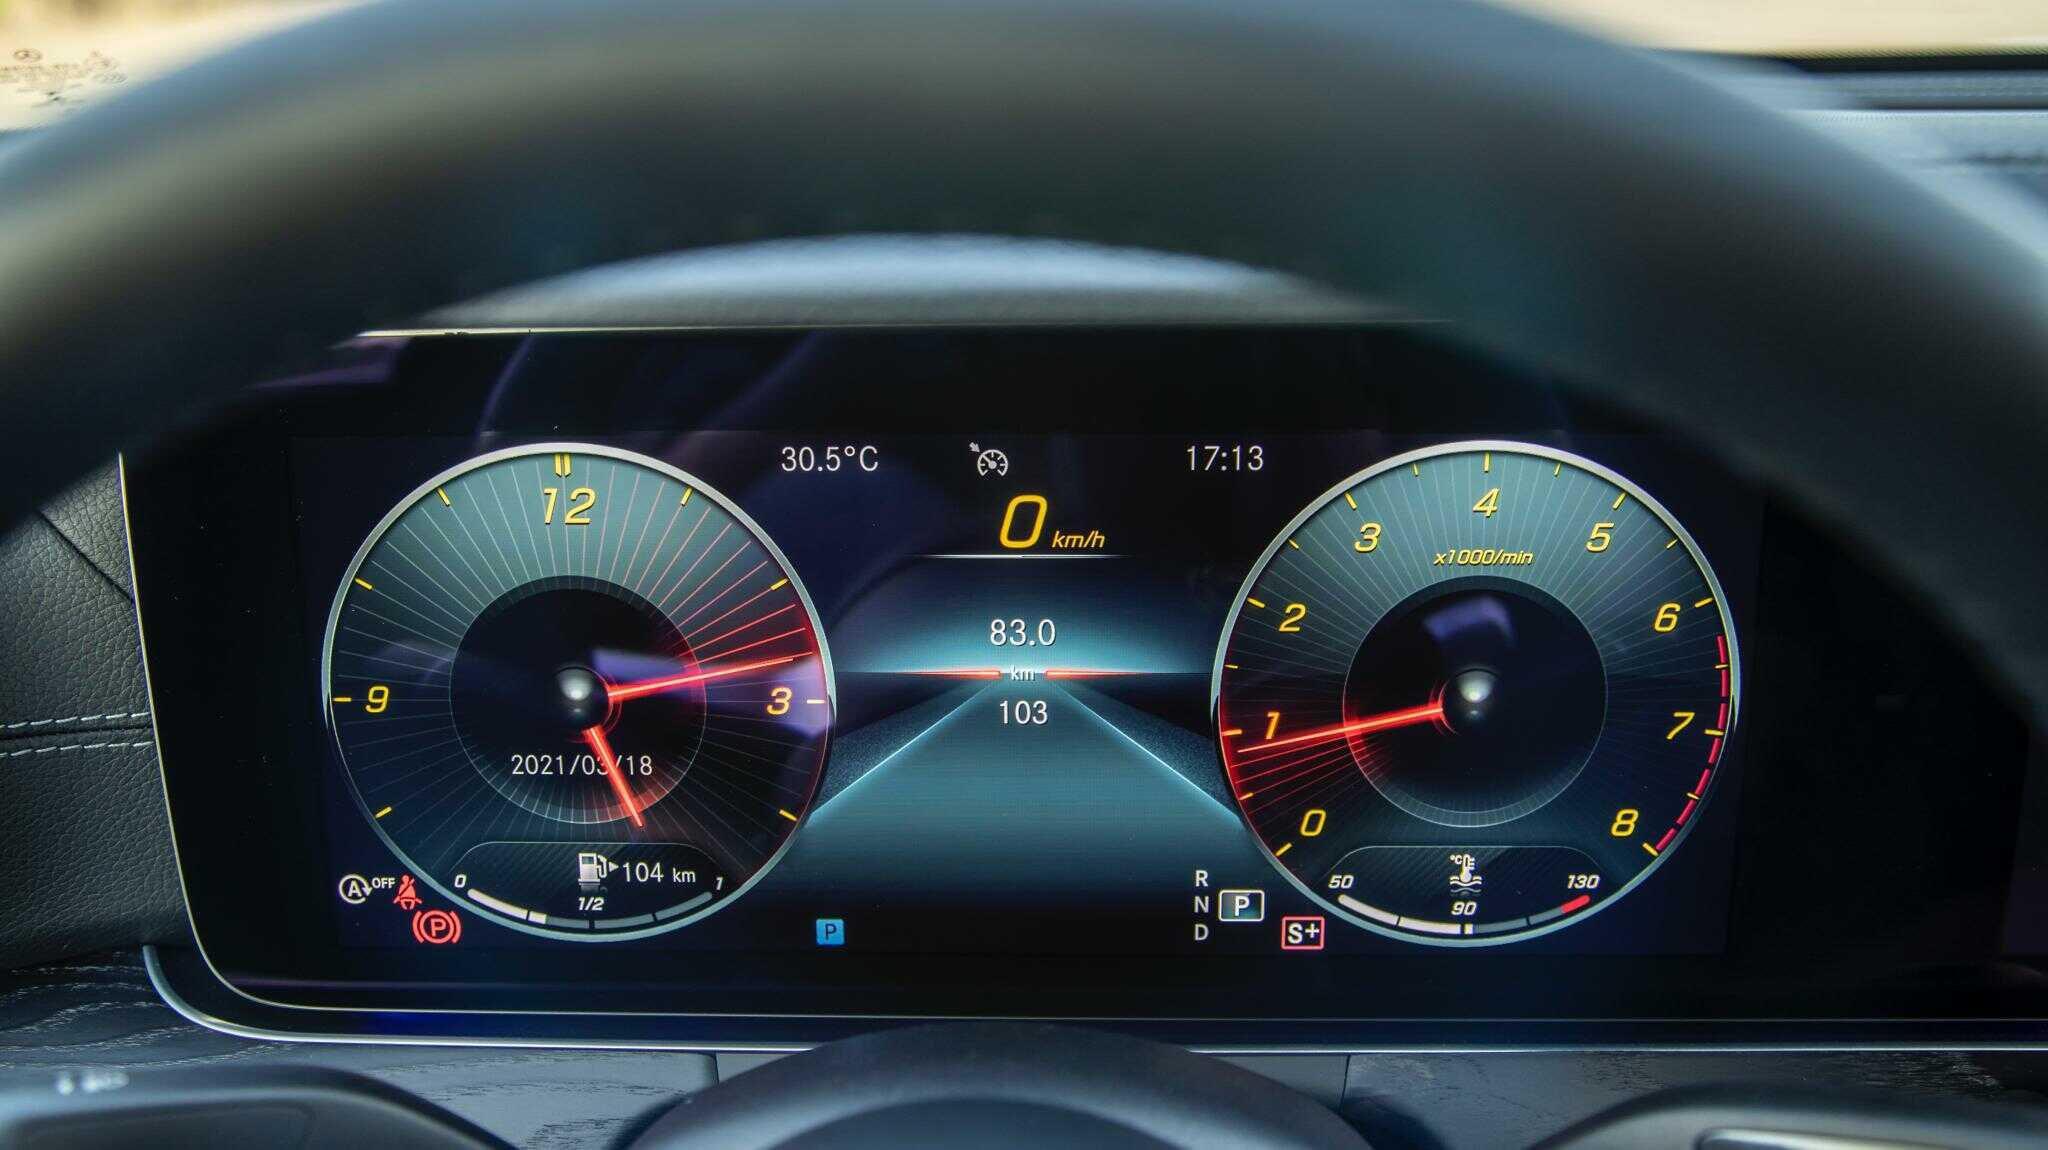 Giá lăn bánh xe Mercedes E300